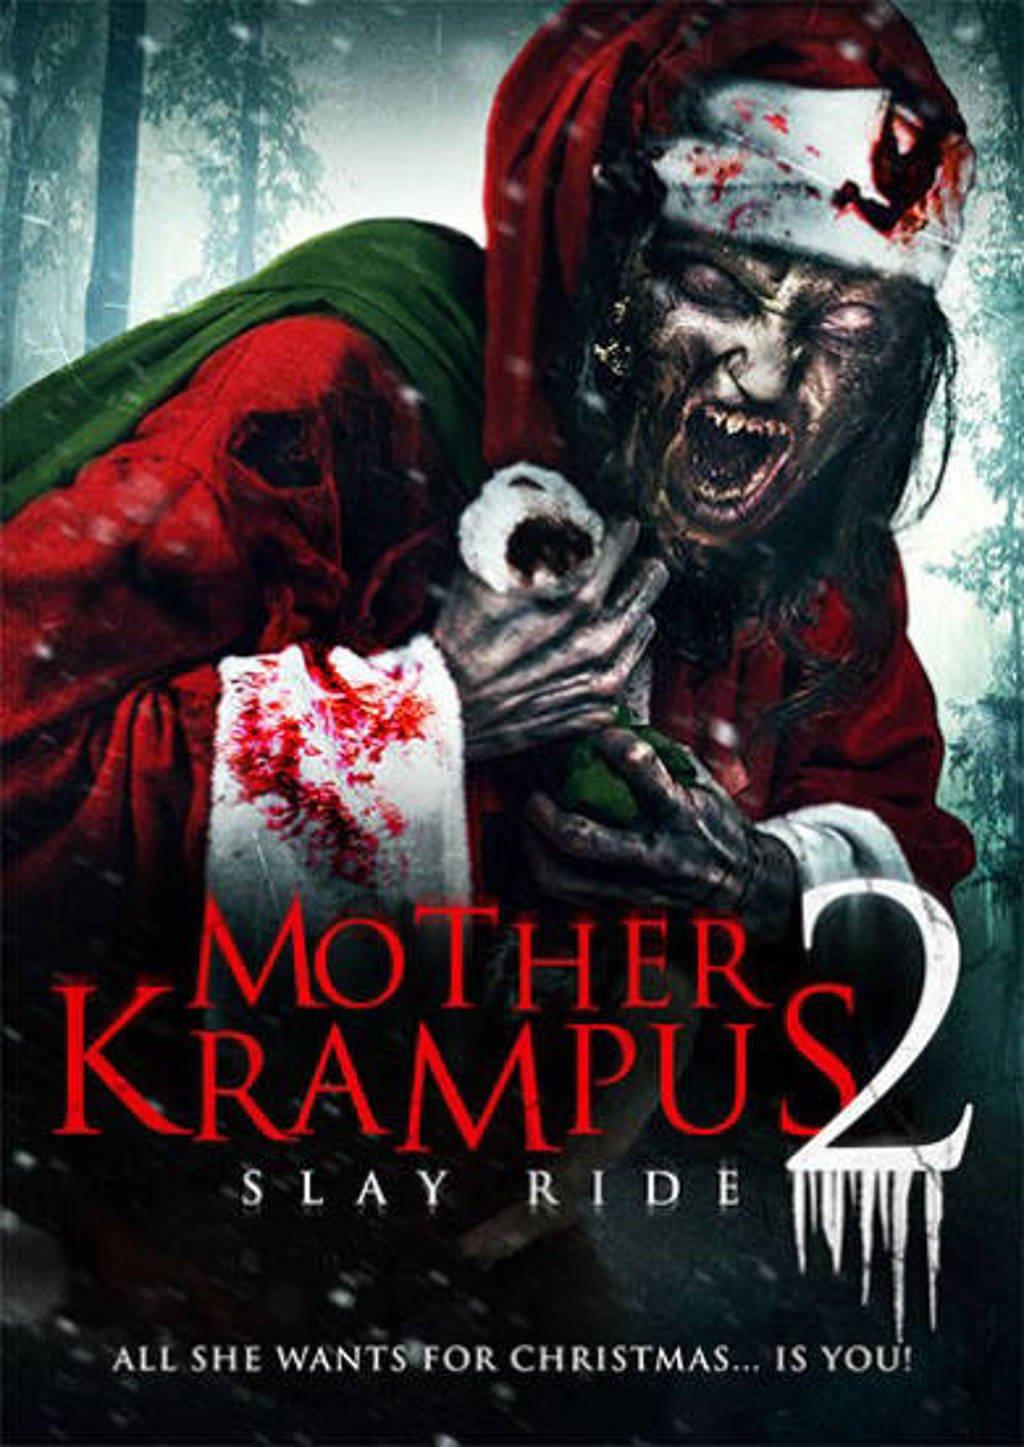 Mother Krampus 2 - Slay ride (DVD)